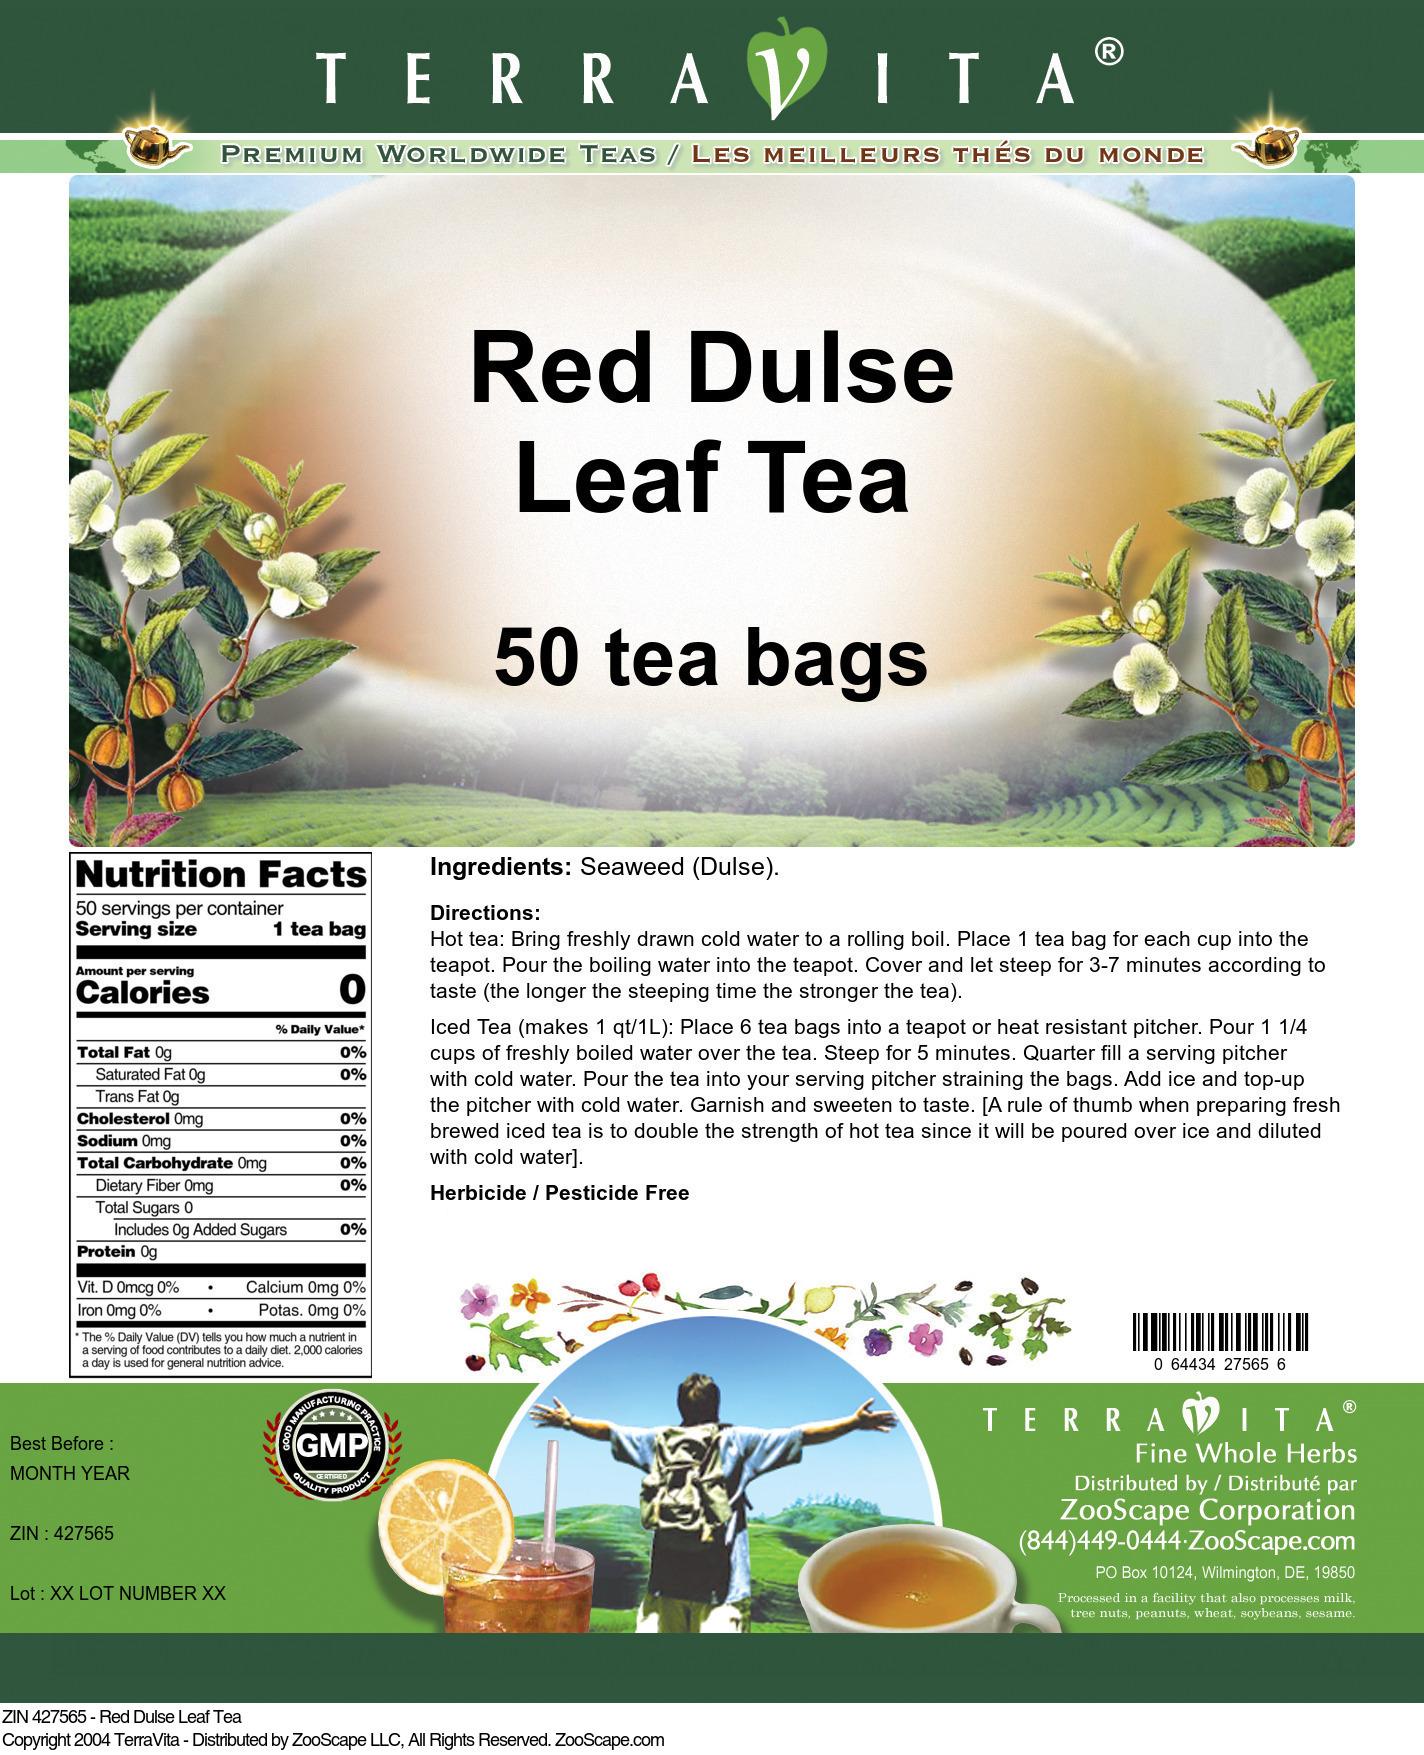 Red Dulse Leaf Tea